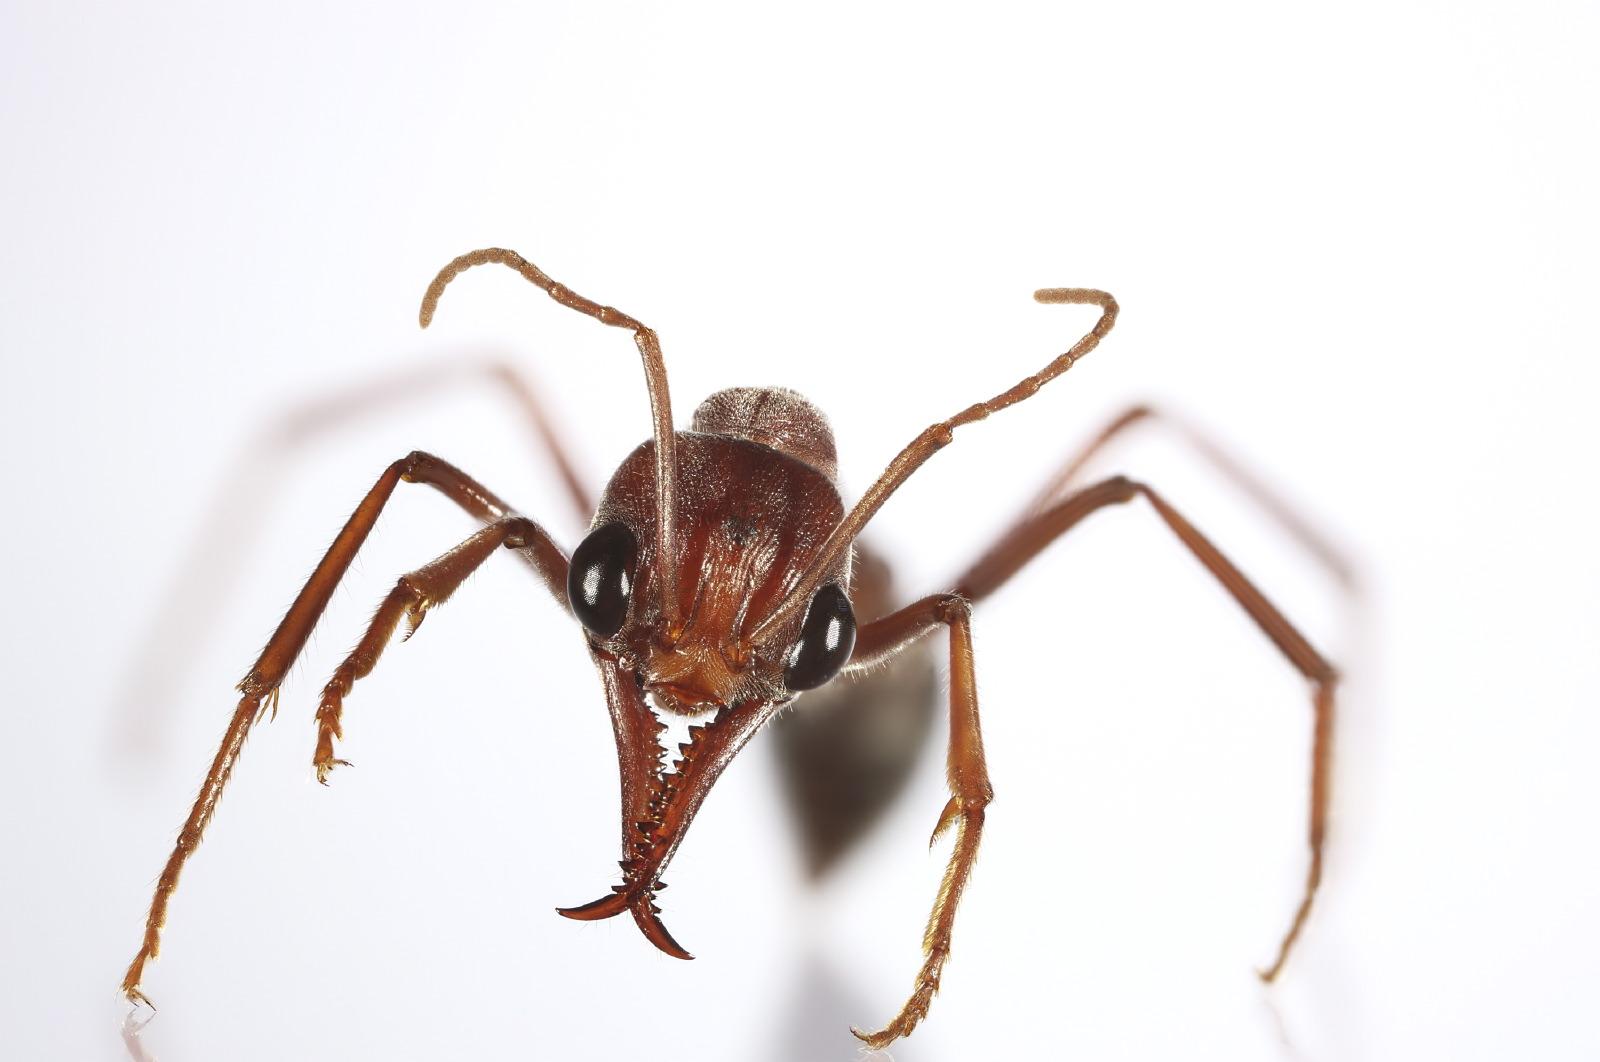 Myrmecia ant full body